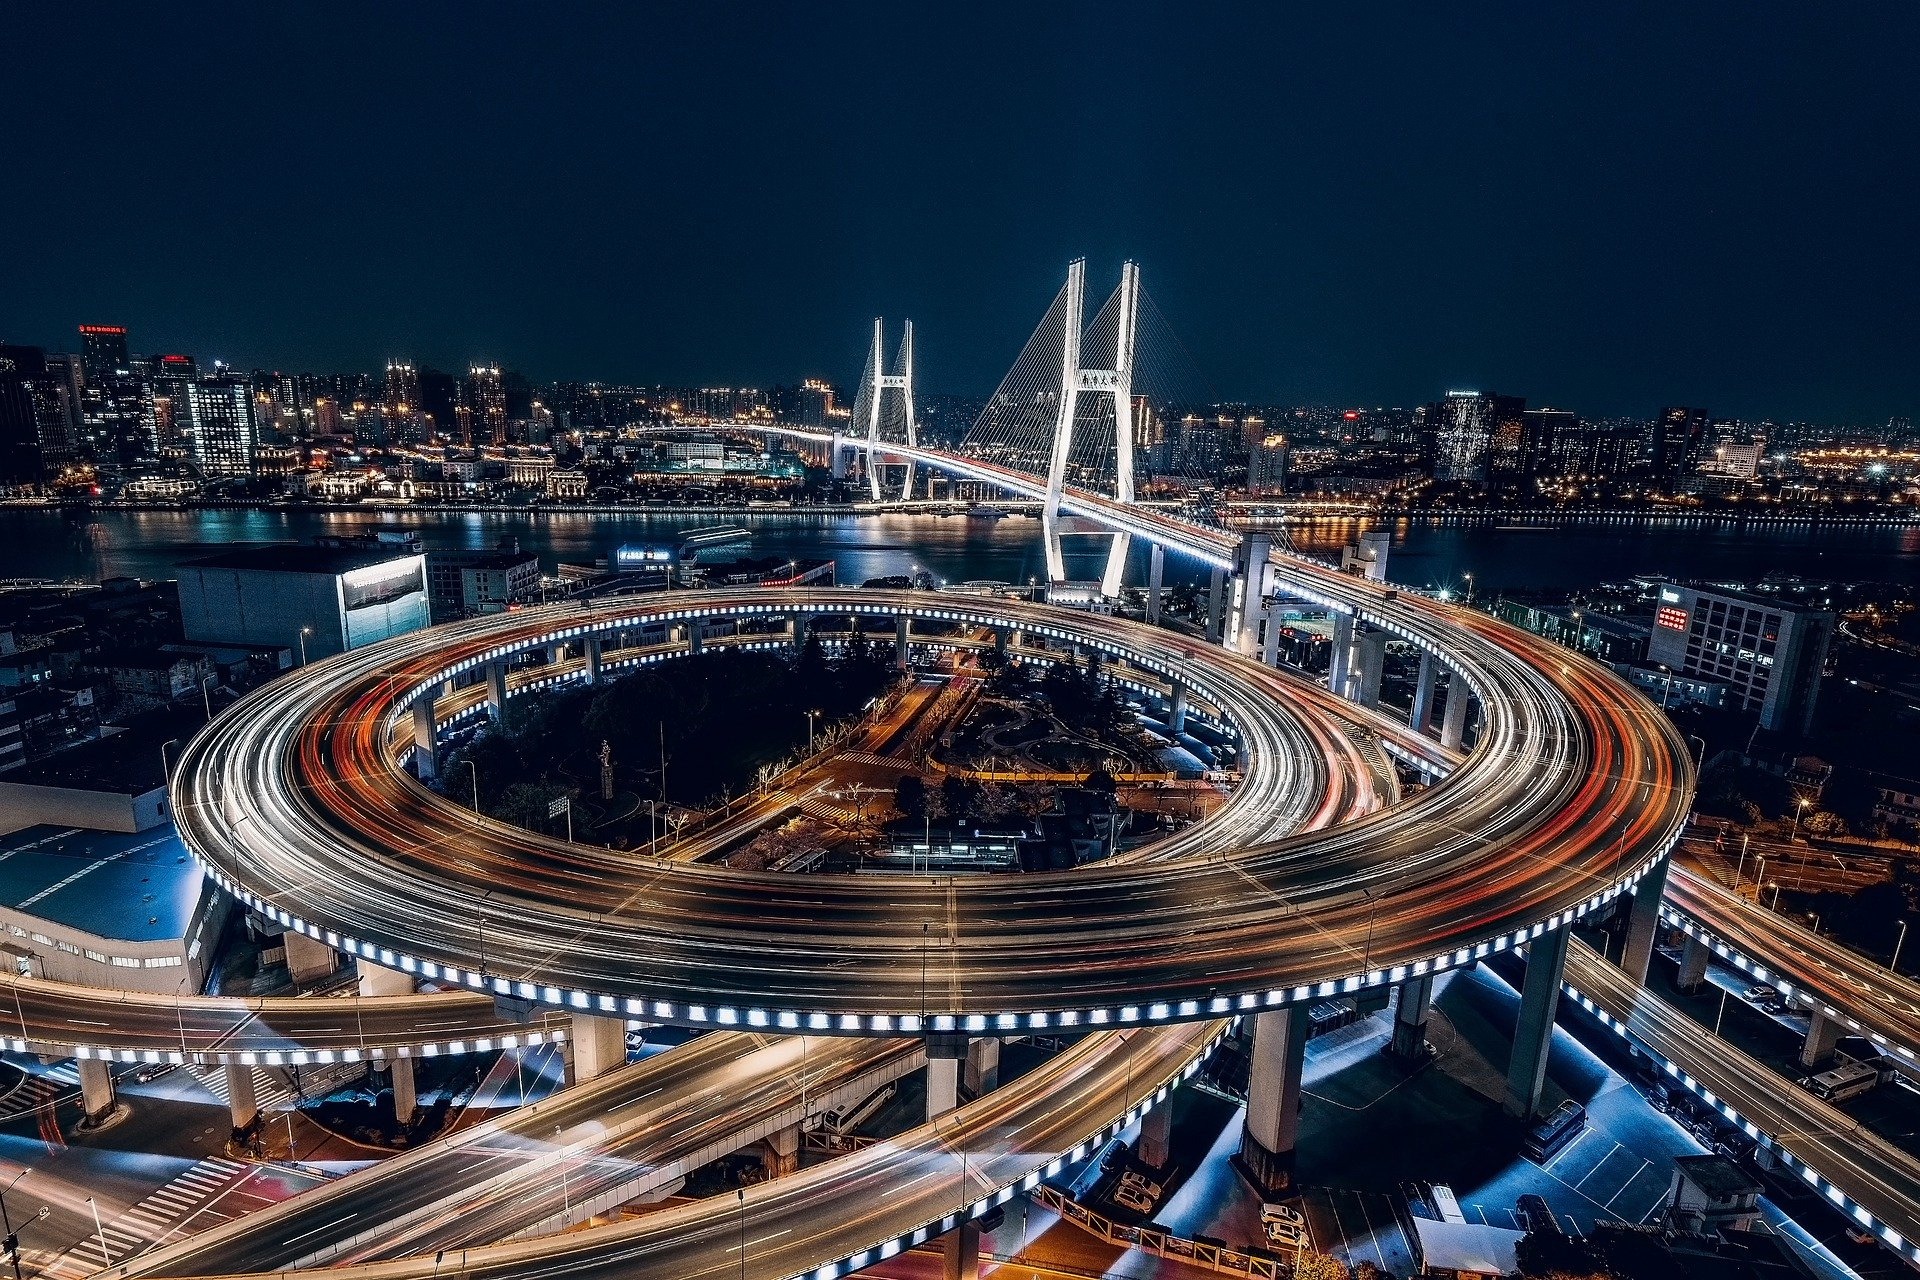 Shanghai dizzying city